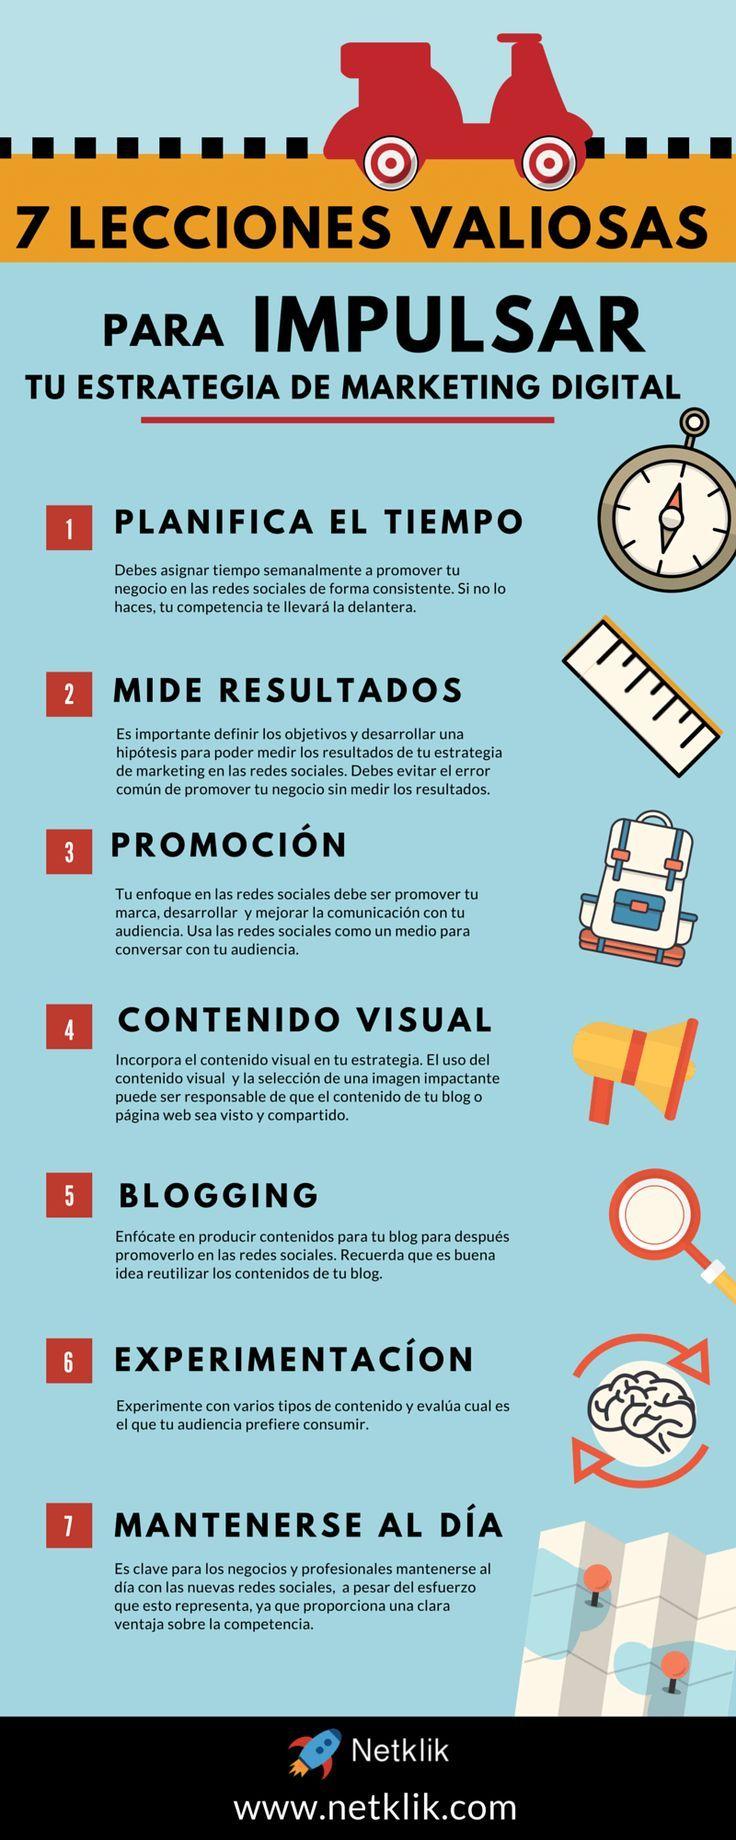 Lecciones valiosas para impulsar tu estrategia de marketing digital